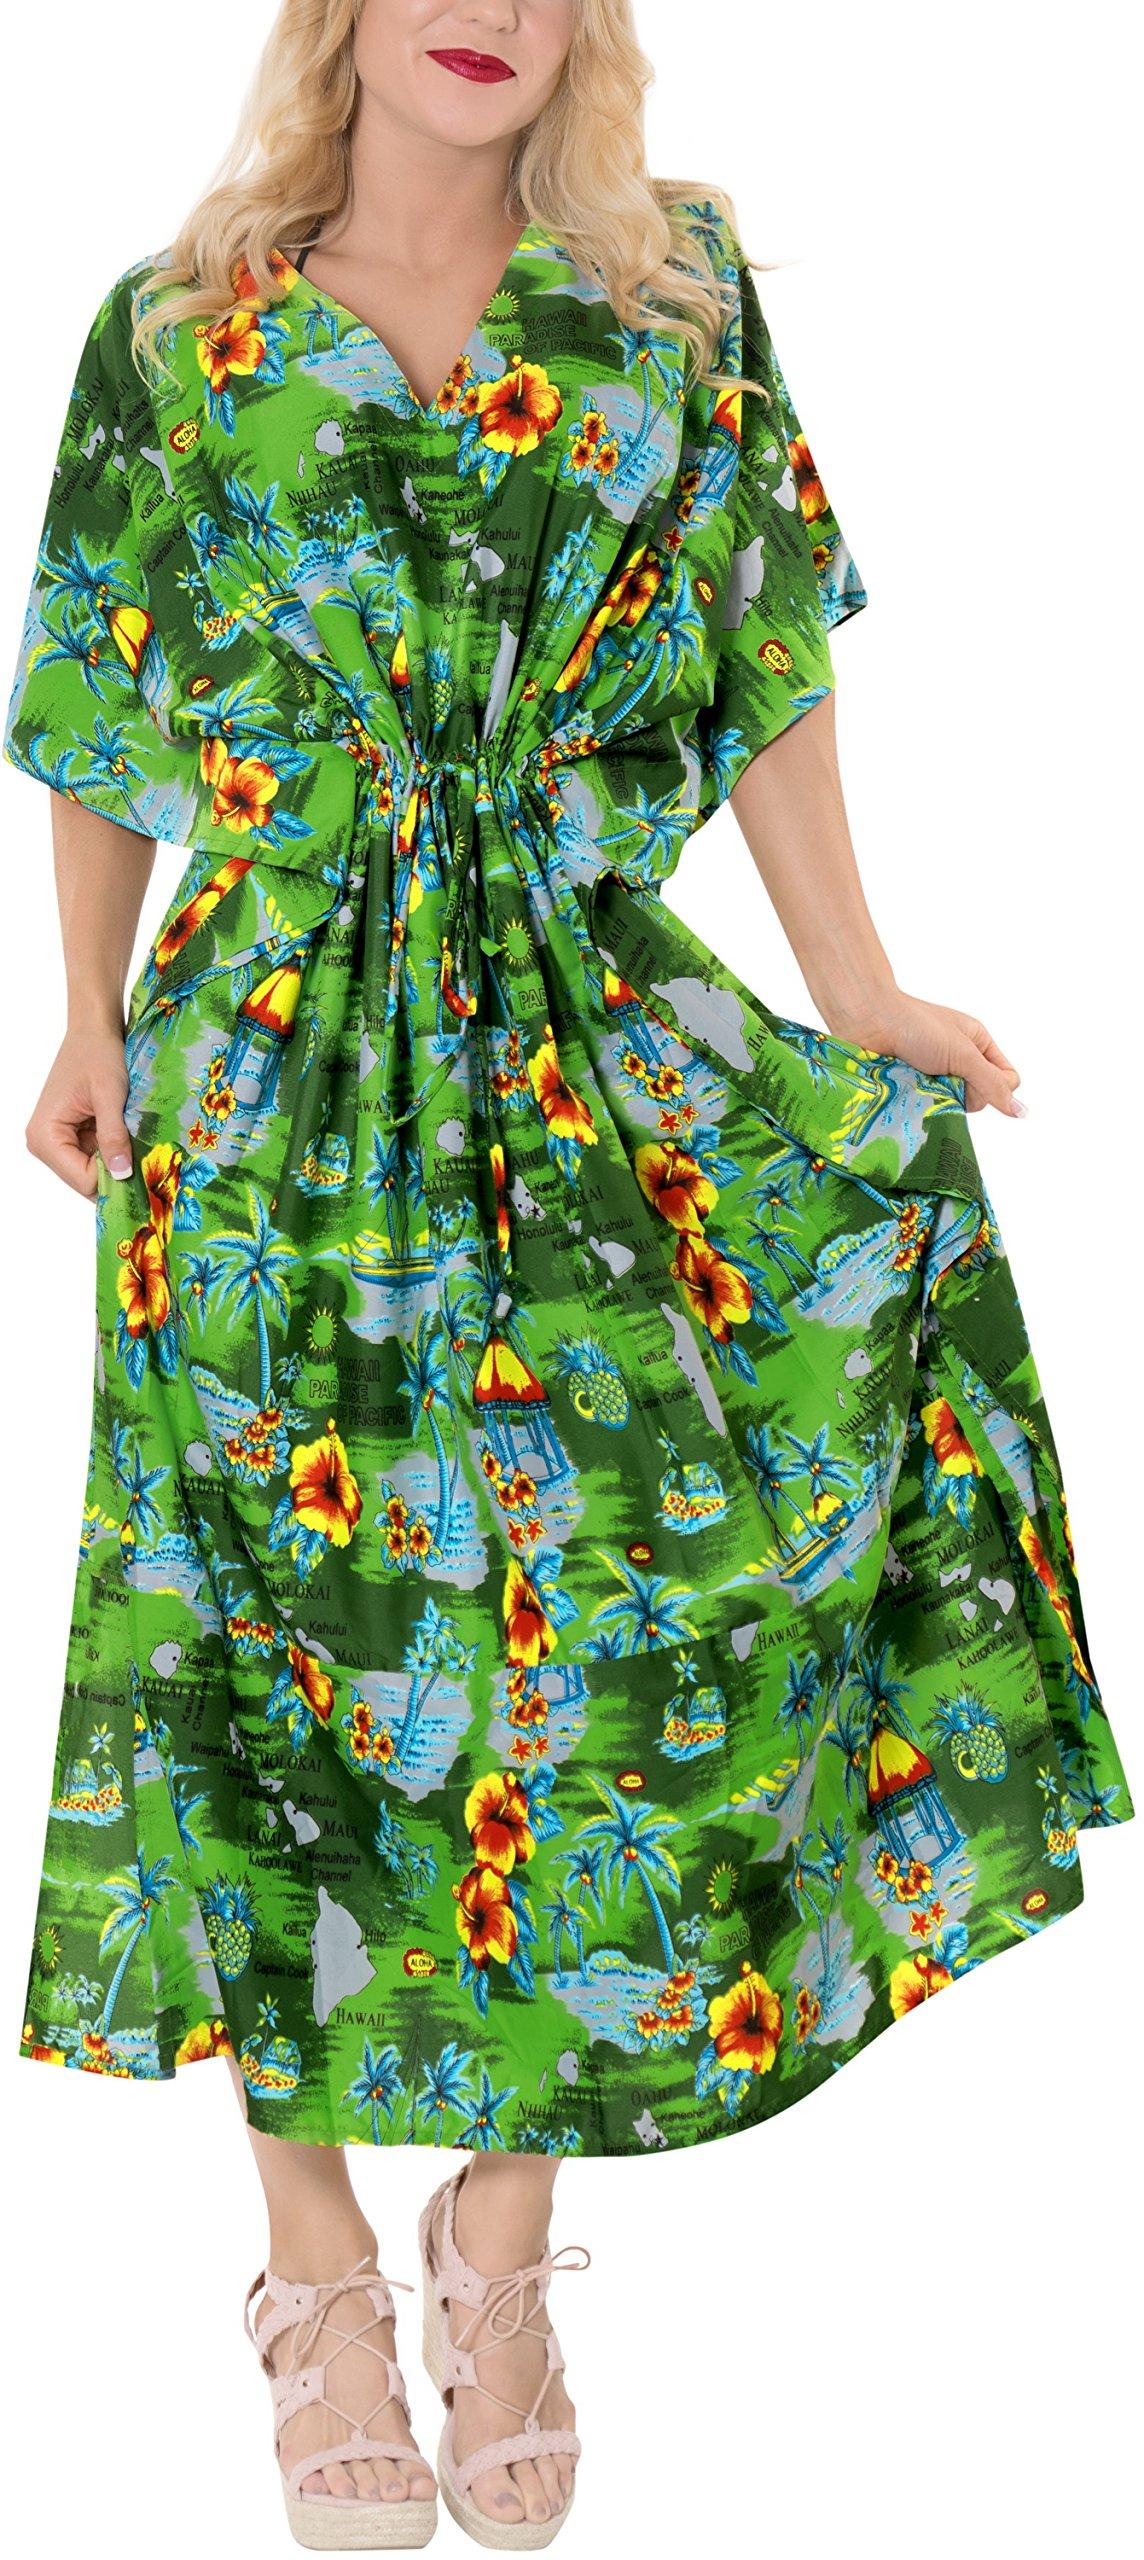 LA LEELA Likre Printed Long Caftan Swimwear Girls Green_591 OSFM 14-22W [L-3X]